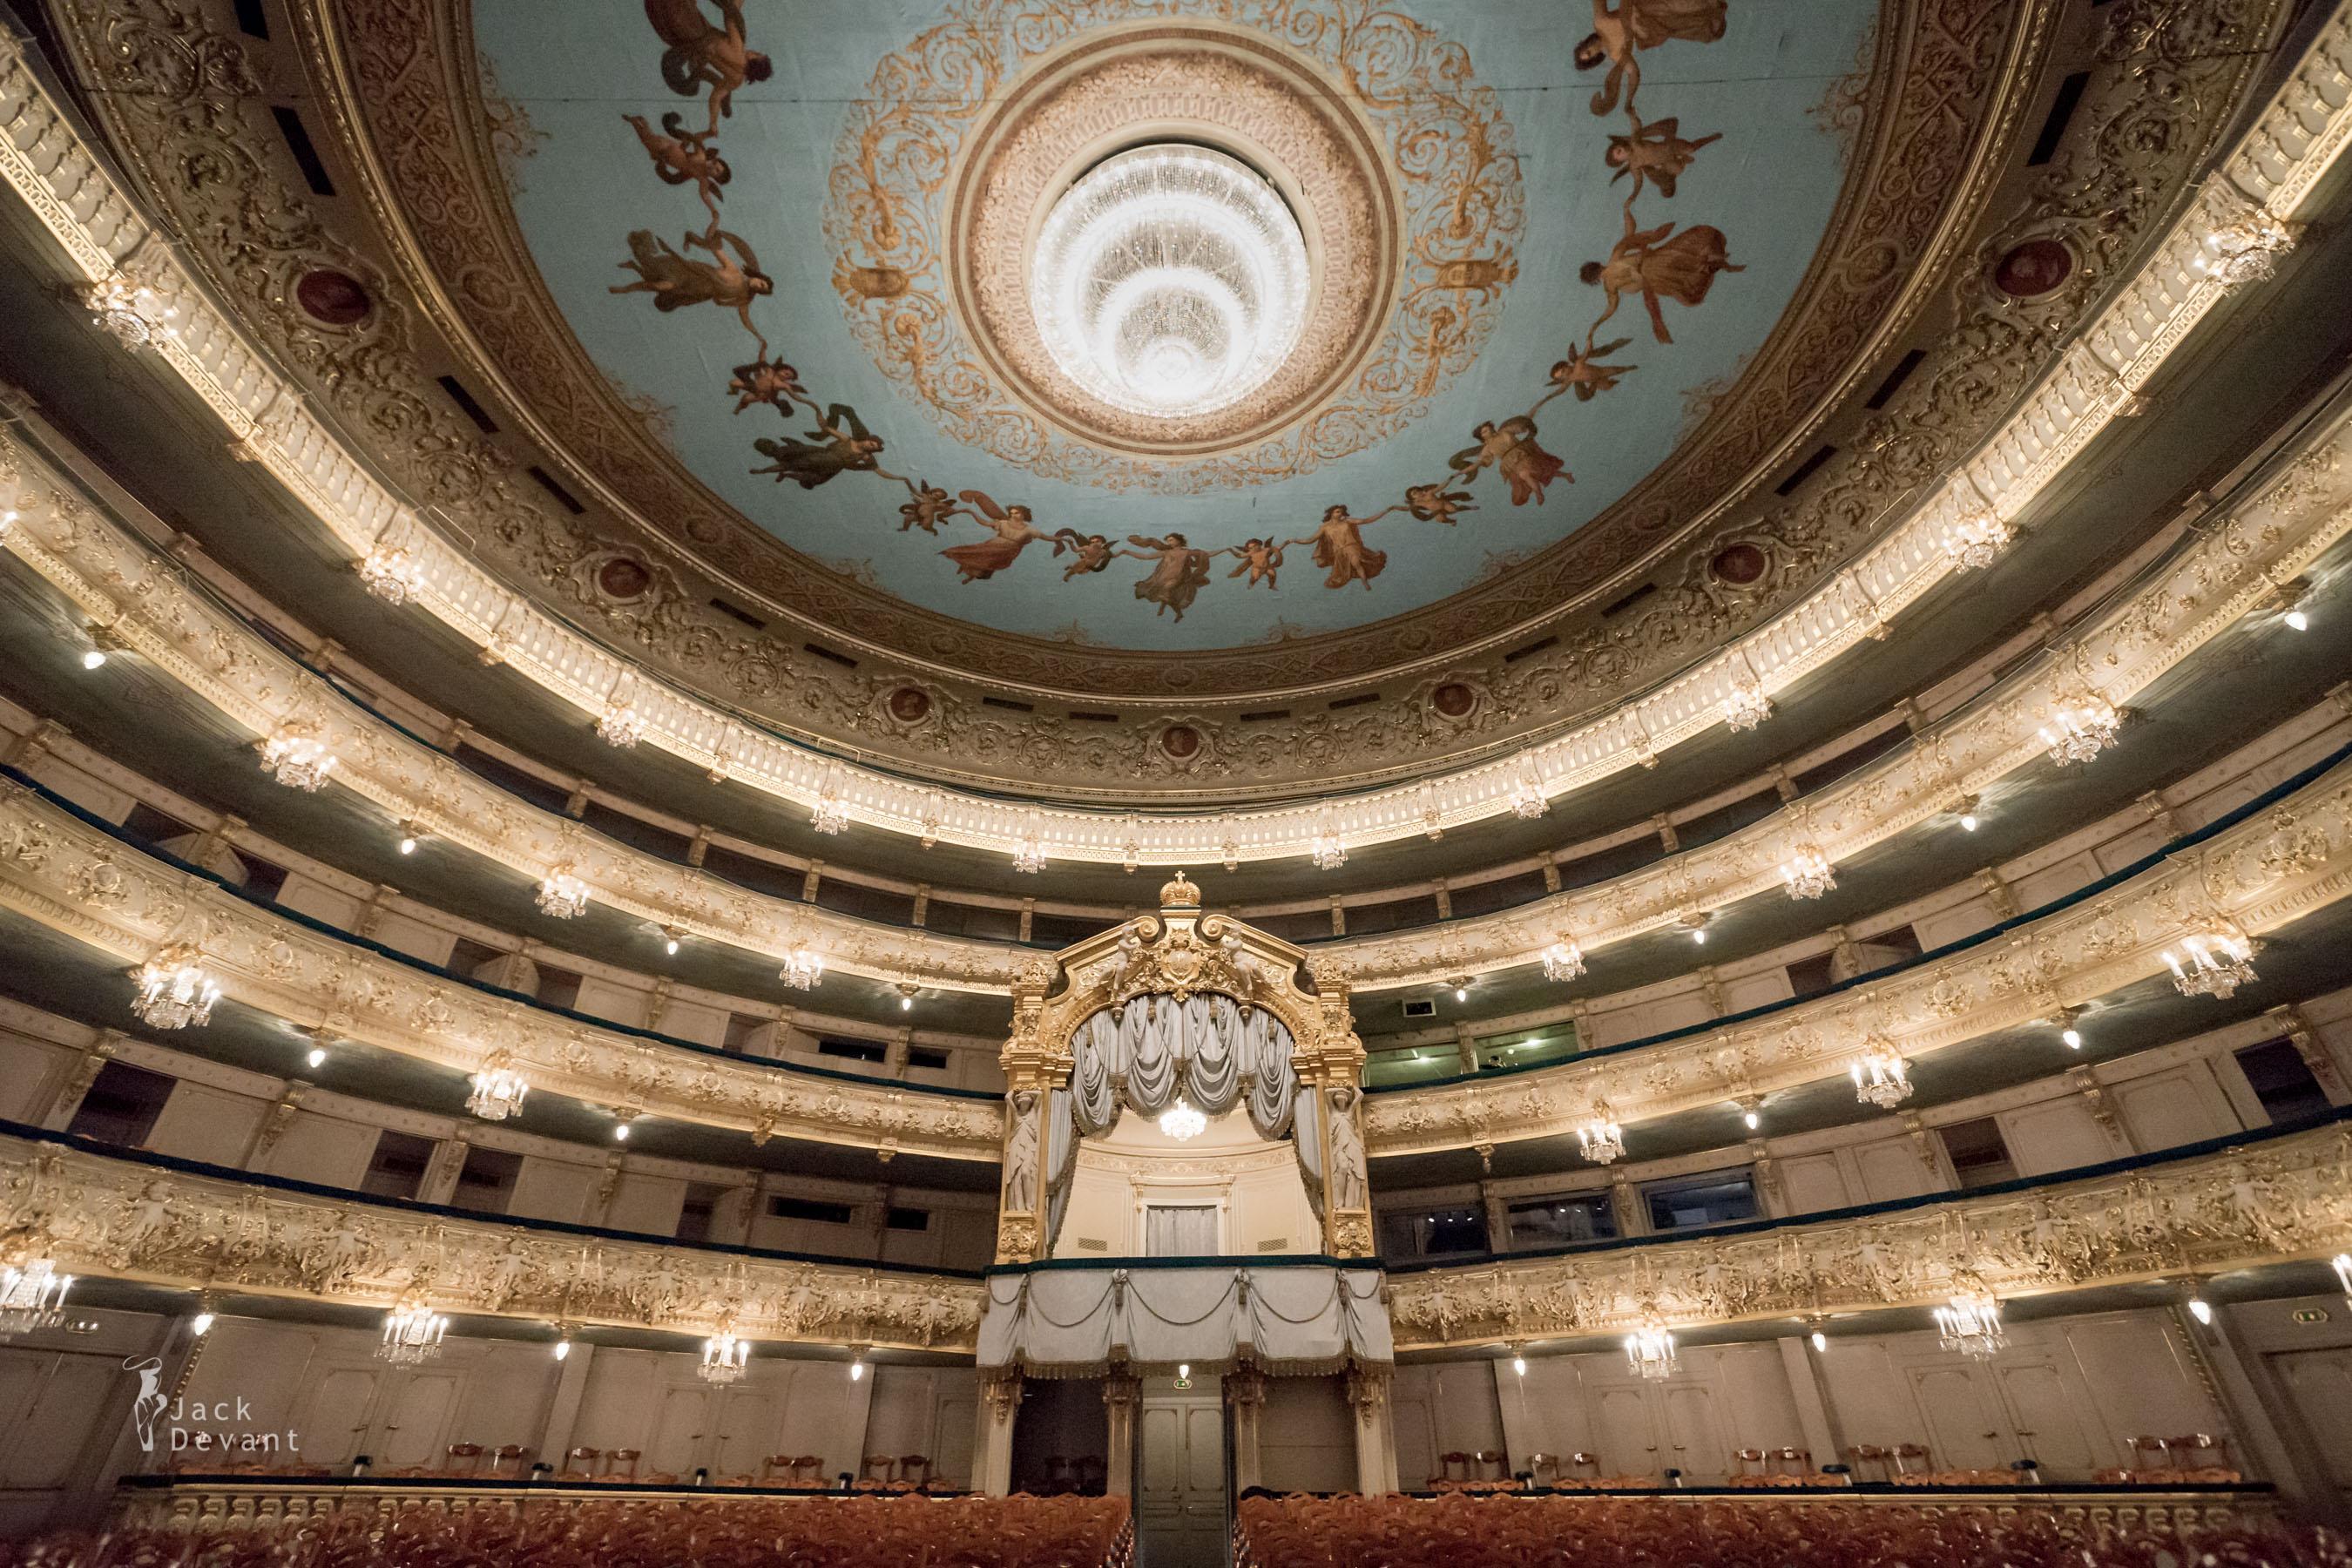 Le Théâtre Mariinsky Jack-Devant-Mariinsky-Theatre-101-3